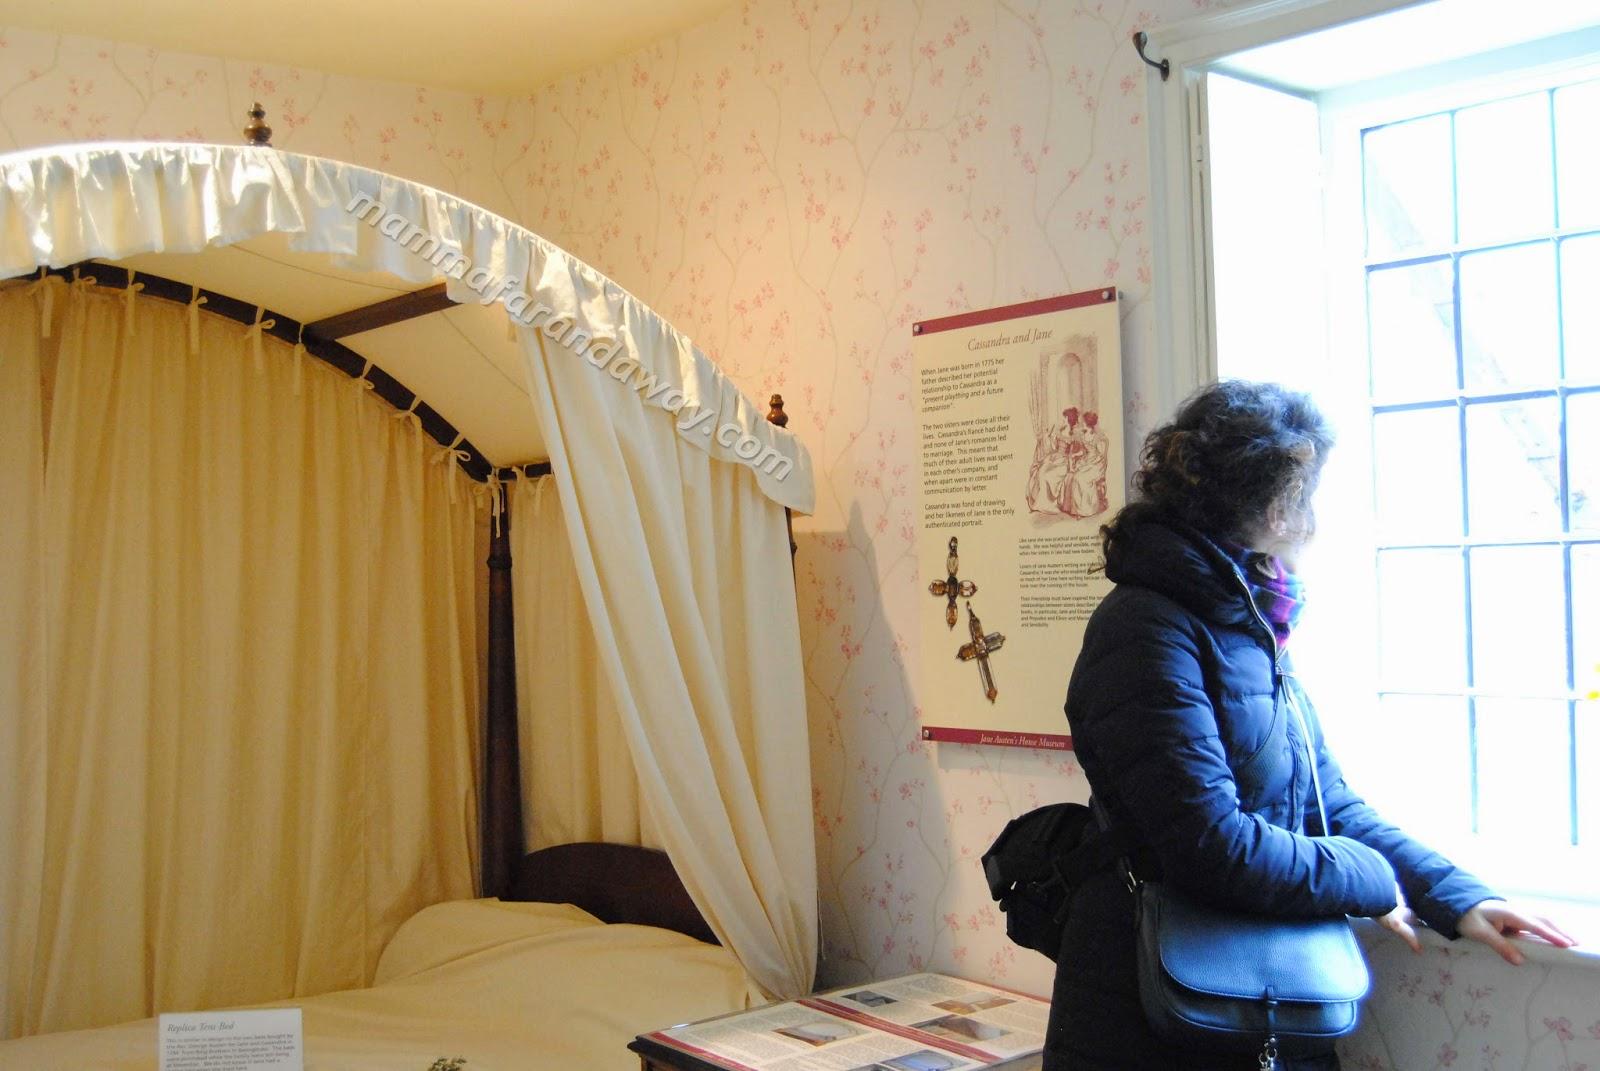 Jane austen 39 s house museum mamma far and away for 2 piani di cabina di ceppi di storia